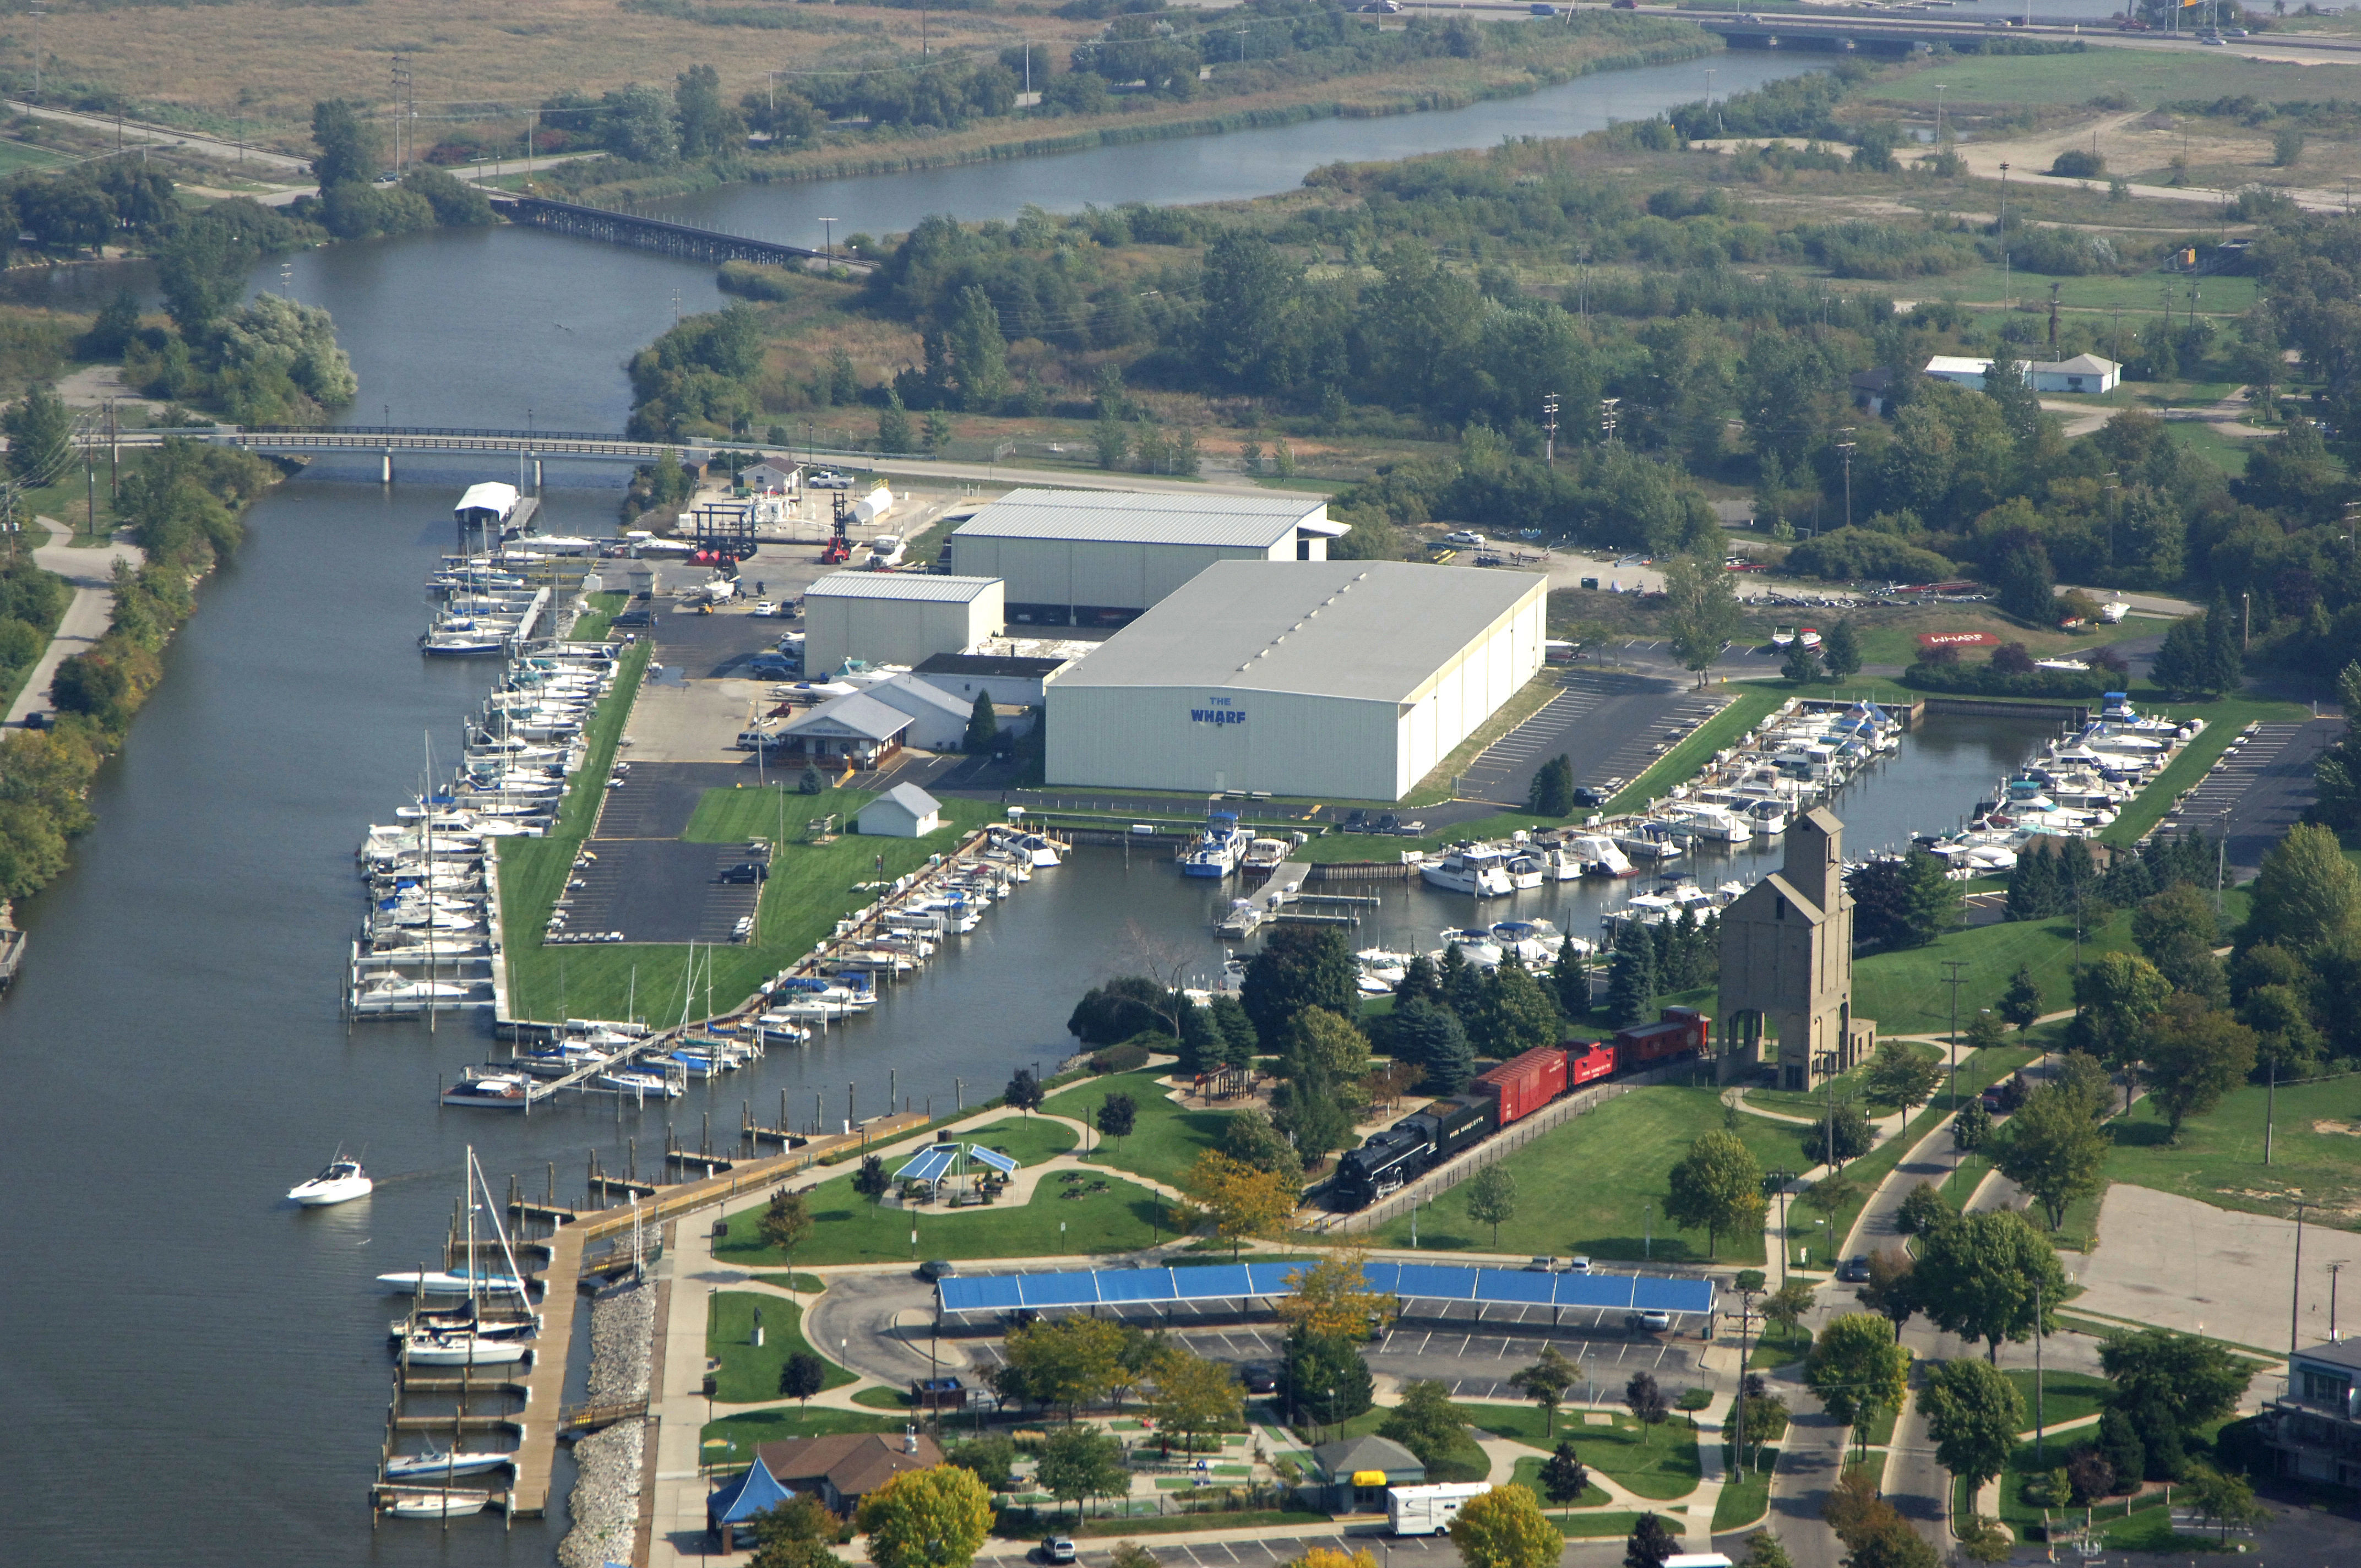 Grand Haven Municipal Marina in Grand Haven, MI, United